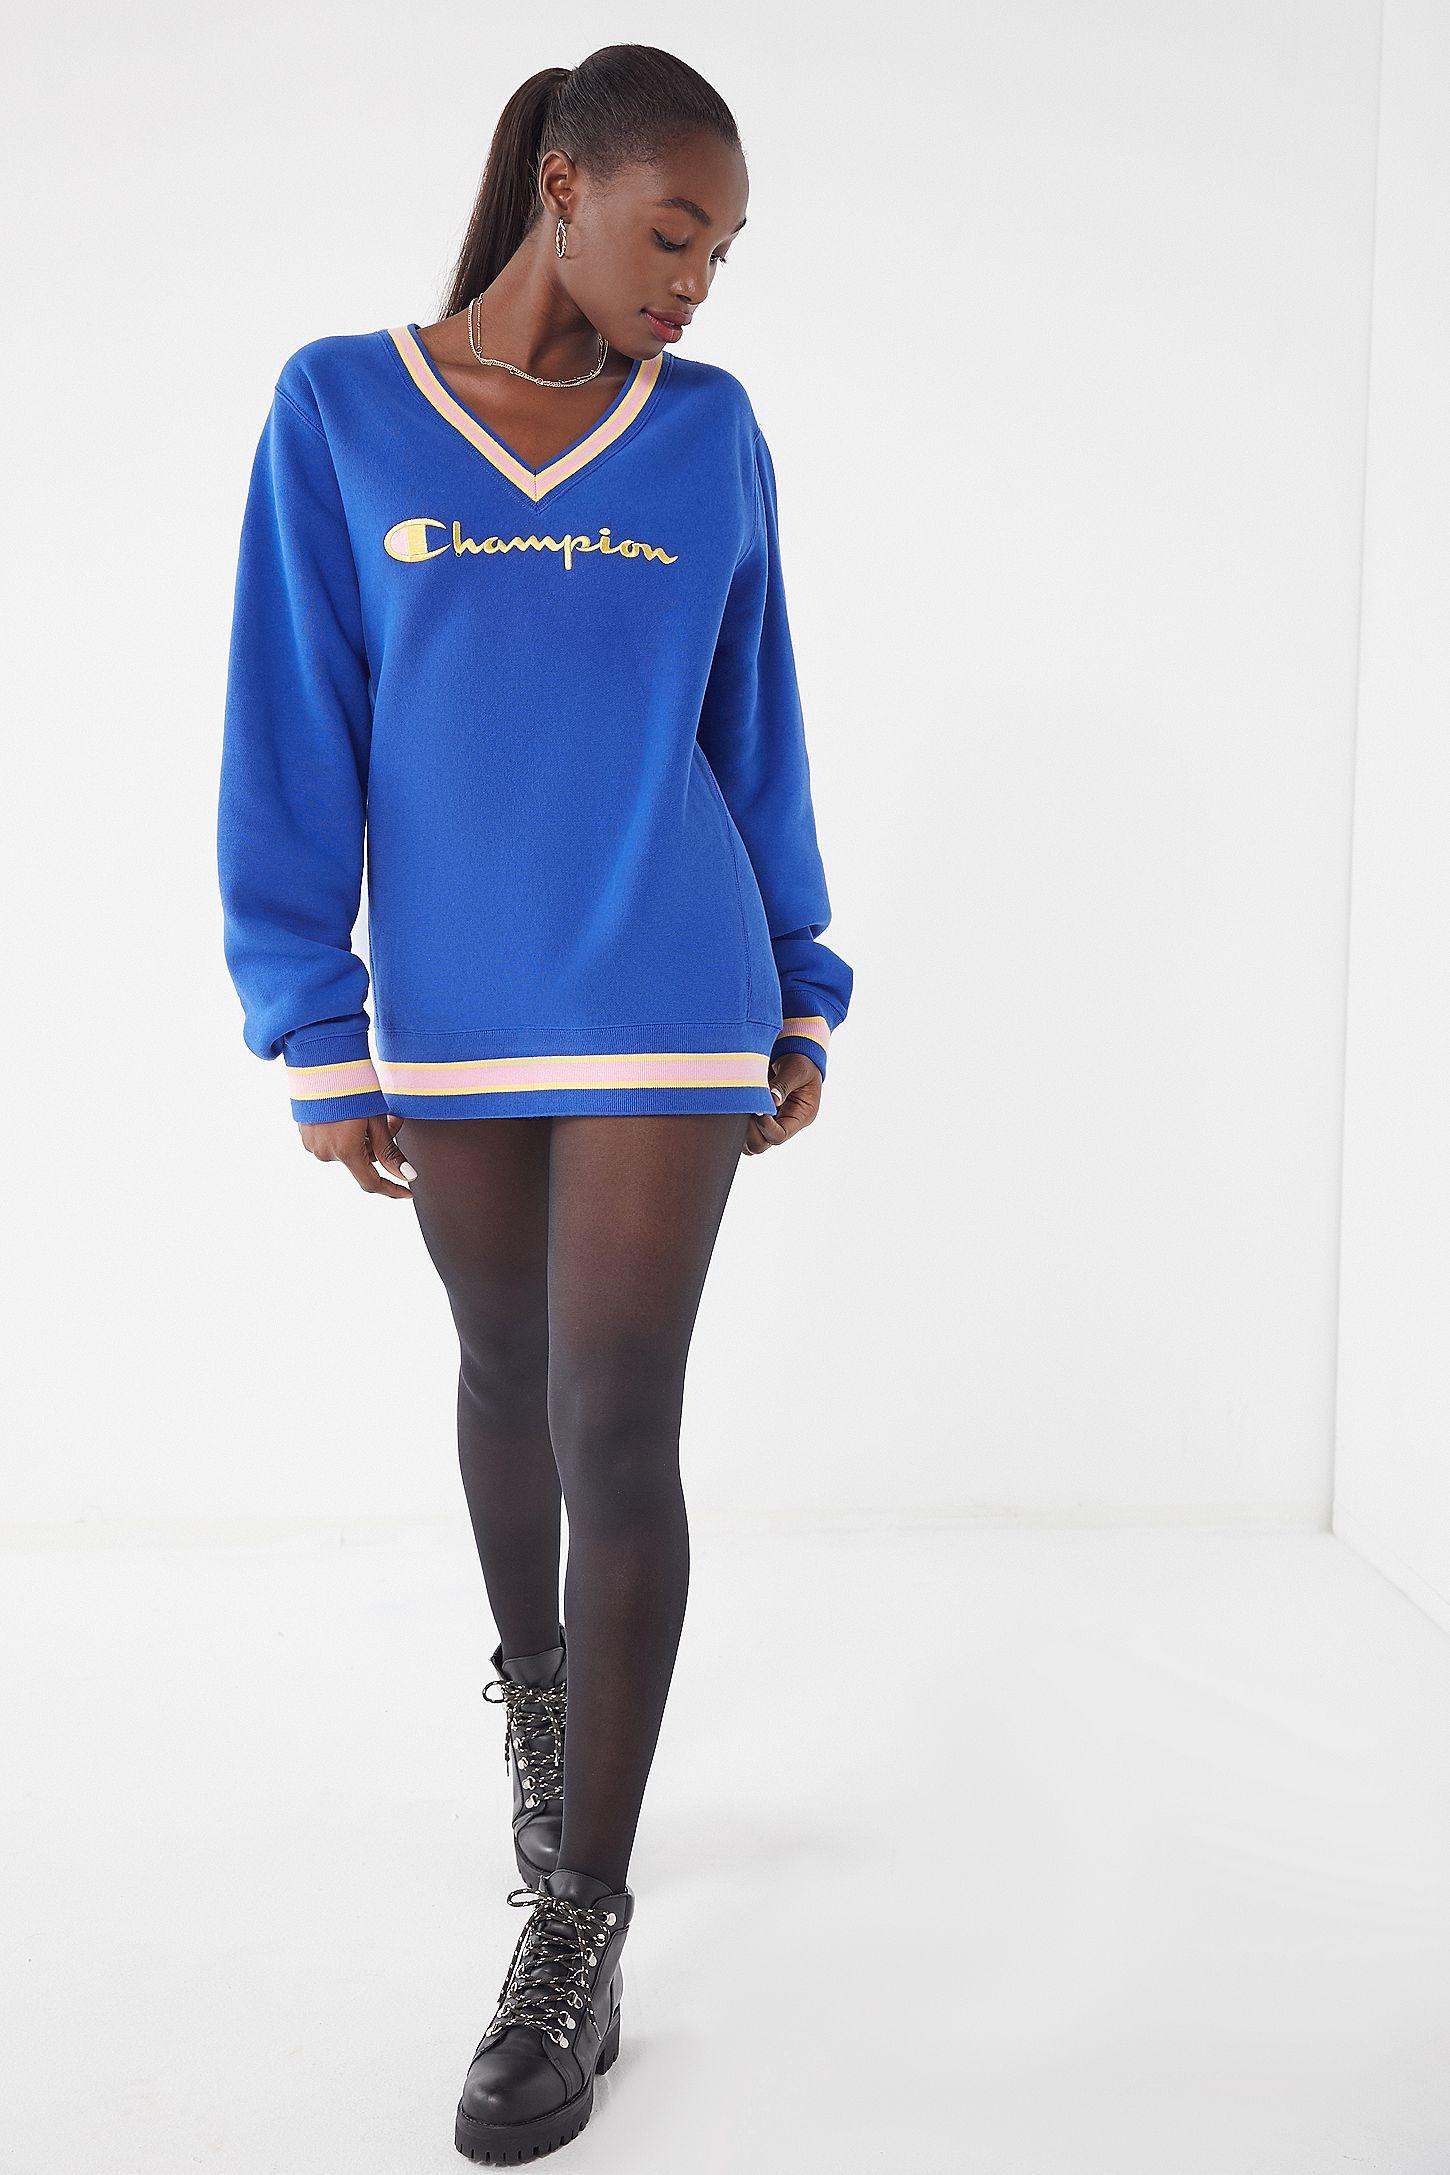 Champion UO Exclusive Fleece VNeck Sweatshirt Cute